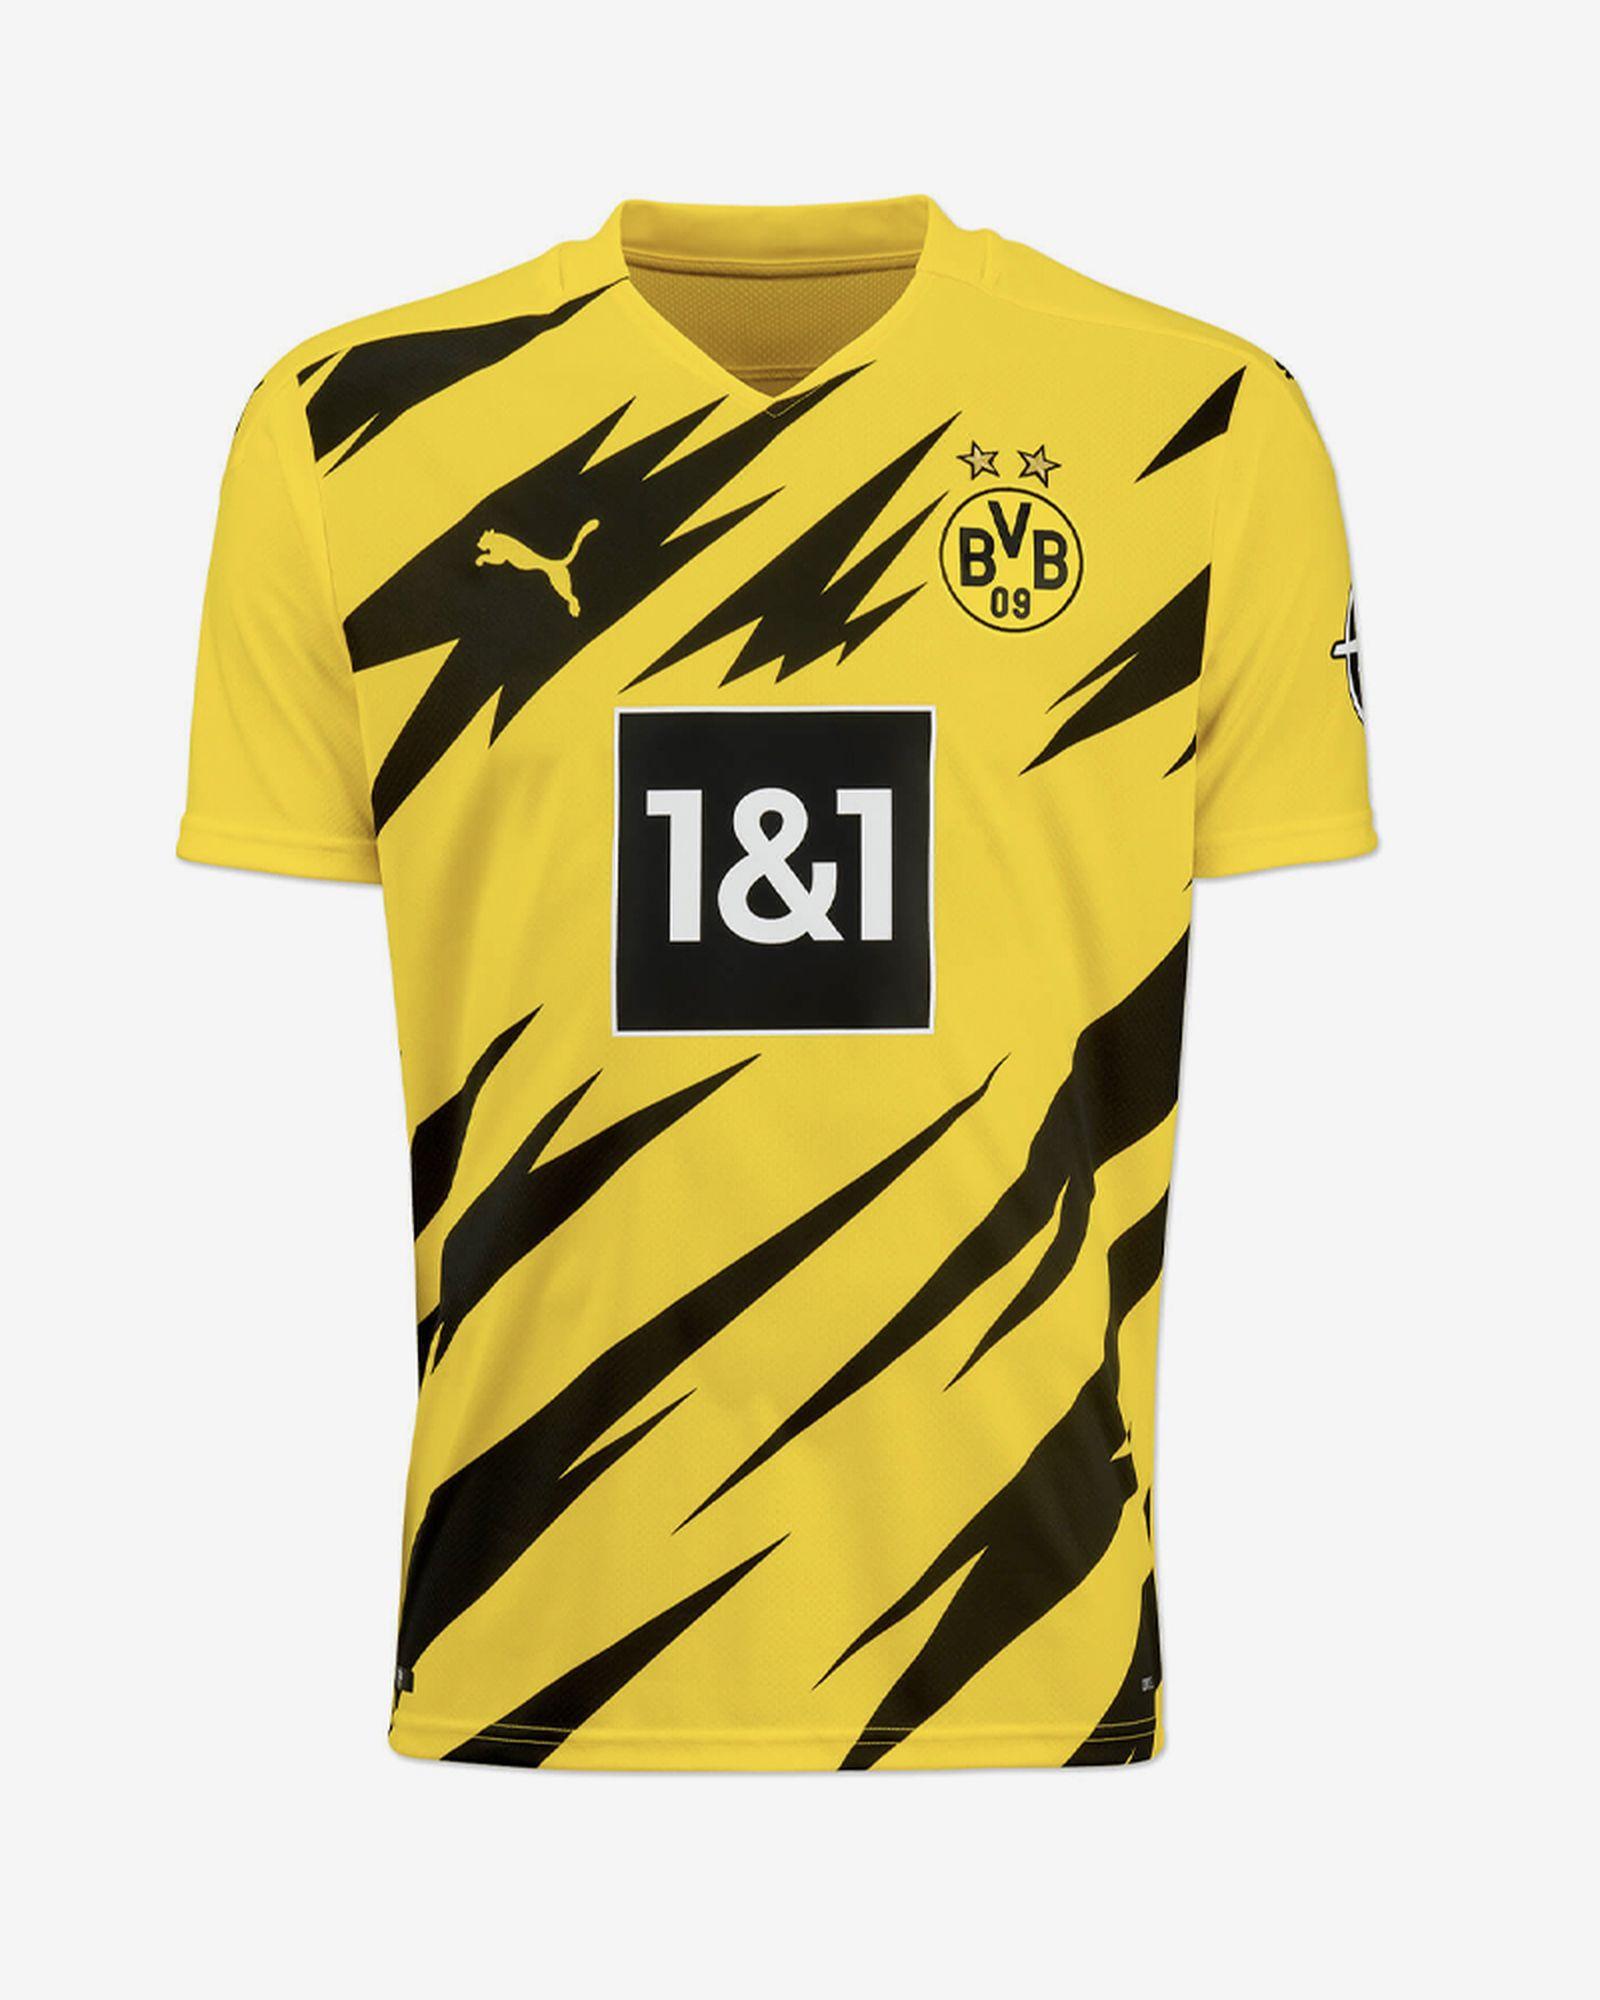 football-shirts-2020-review-15